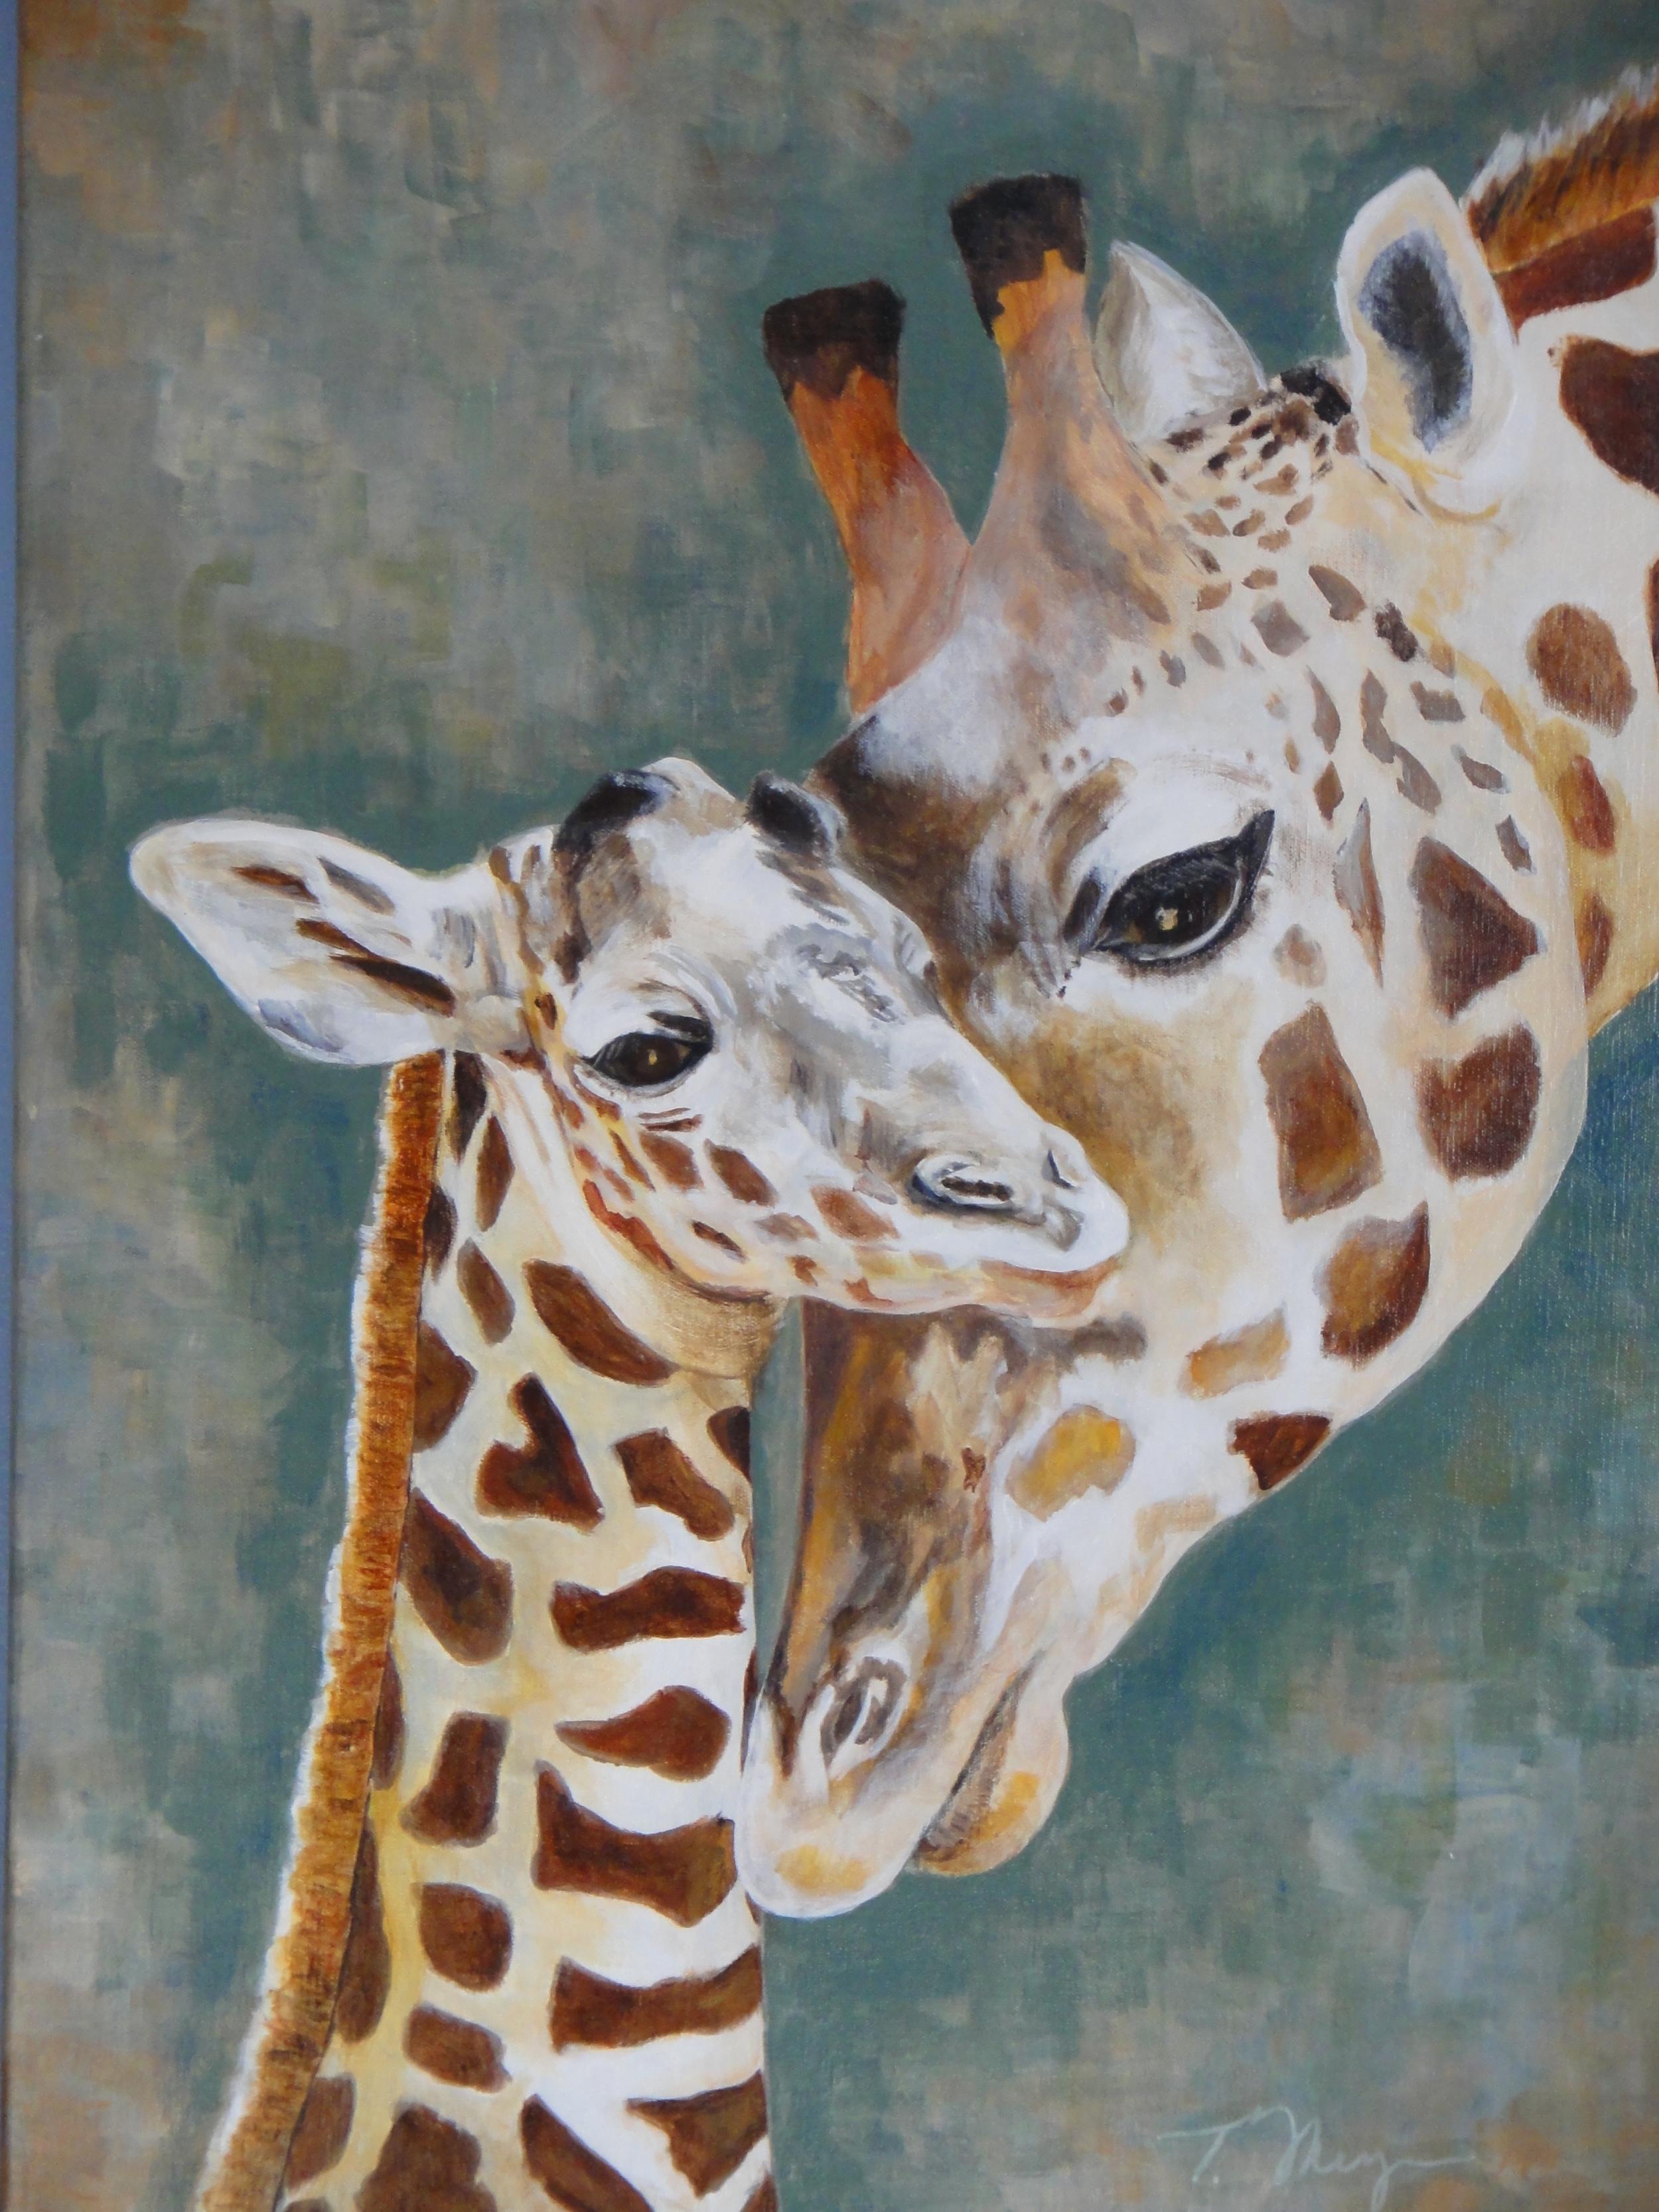 """Giraffe Bonding"" by Terry Meyer"